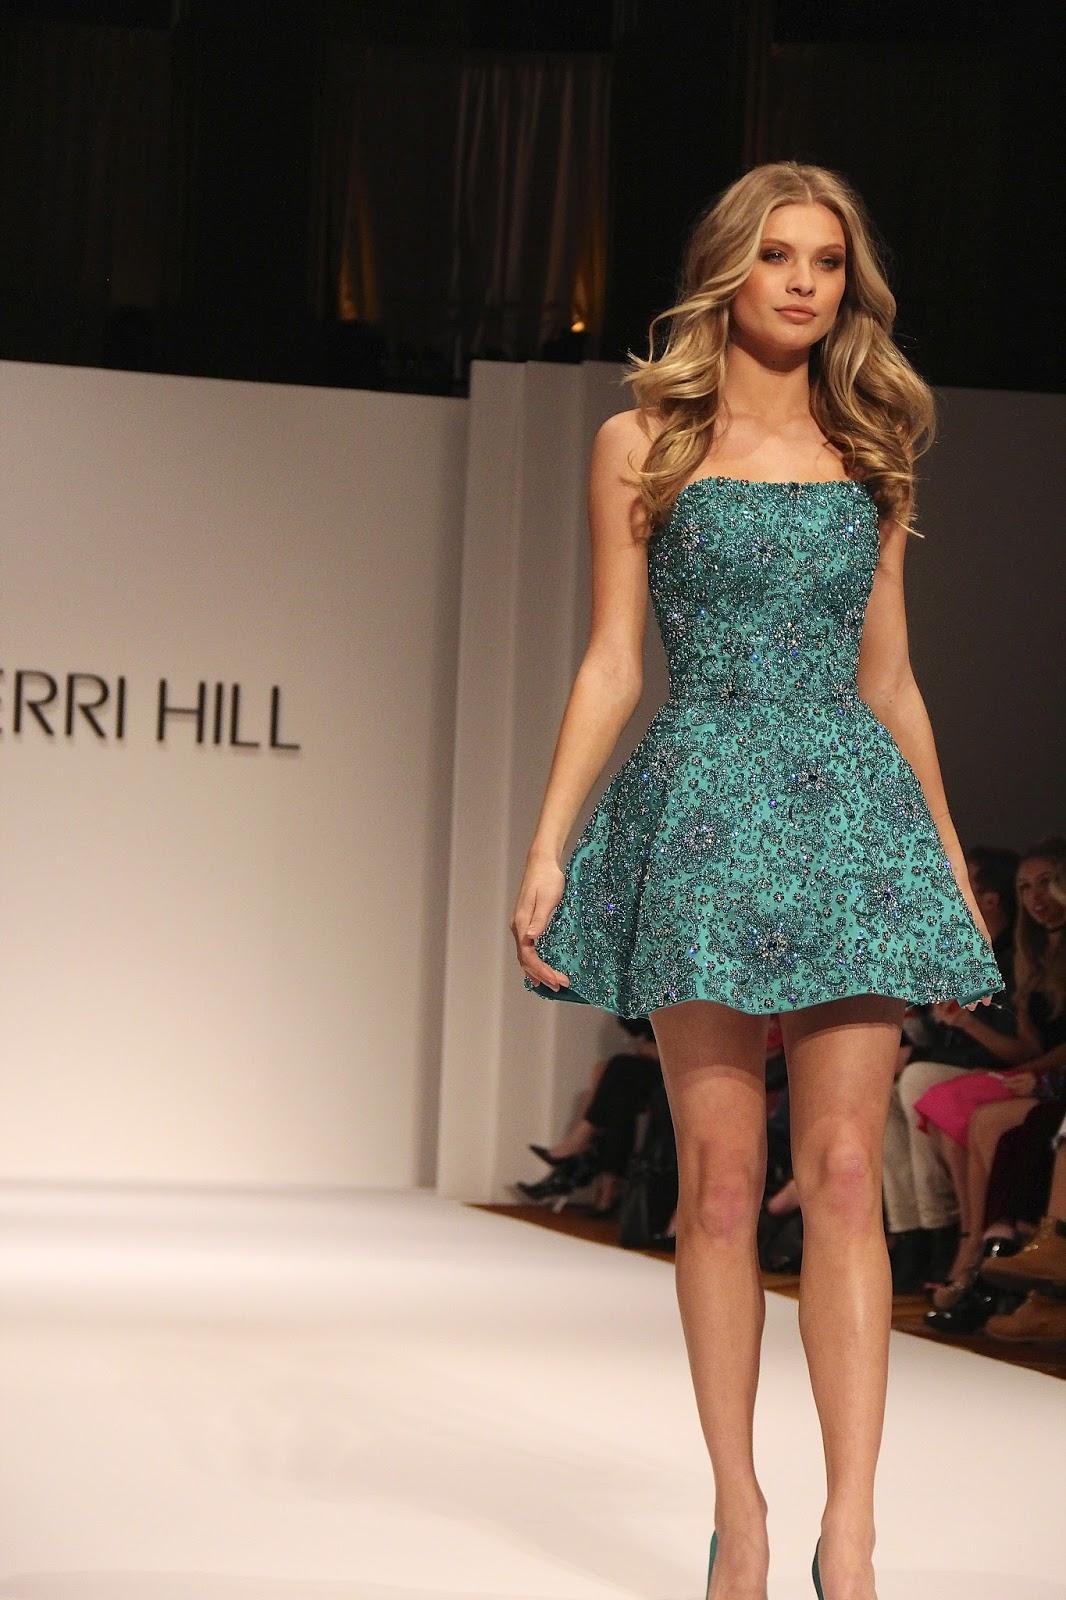 c68d39e6eee fashionably petite  Sherri Hill Fall Winter 2017 at New York Fashion ...